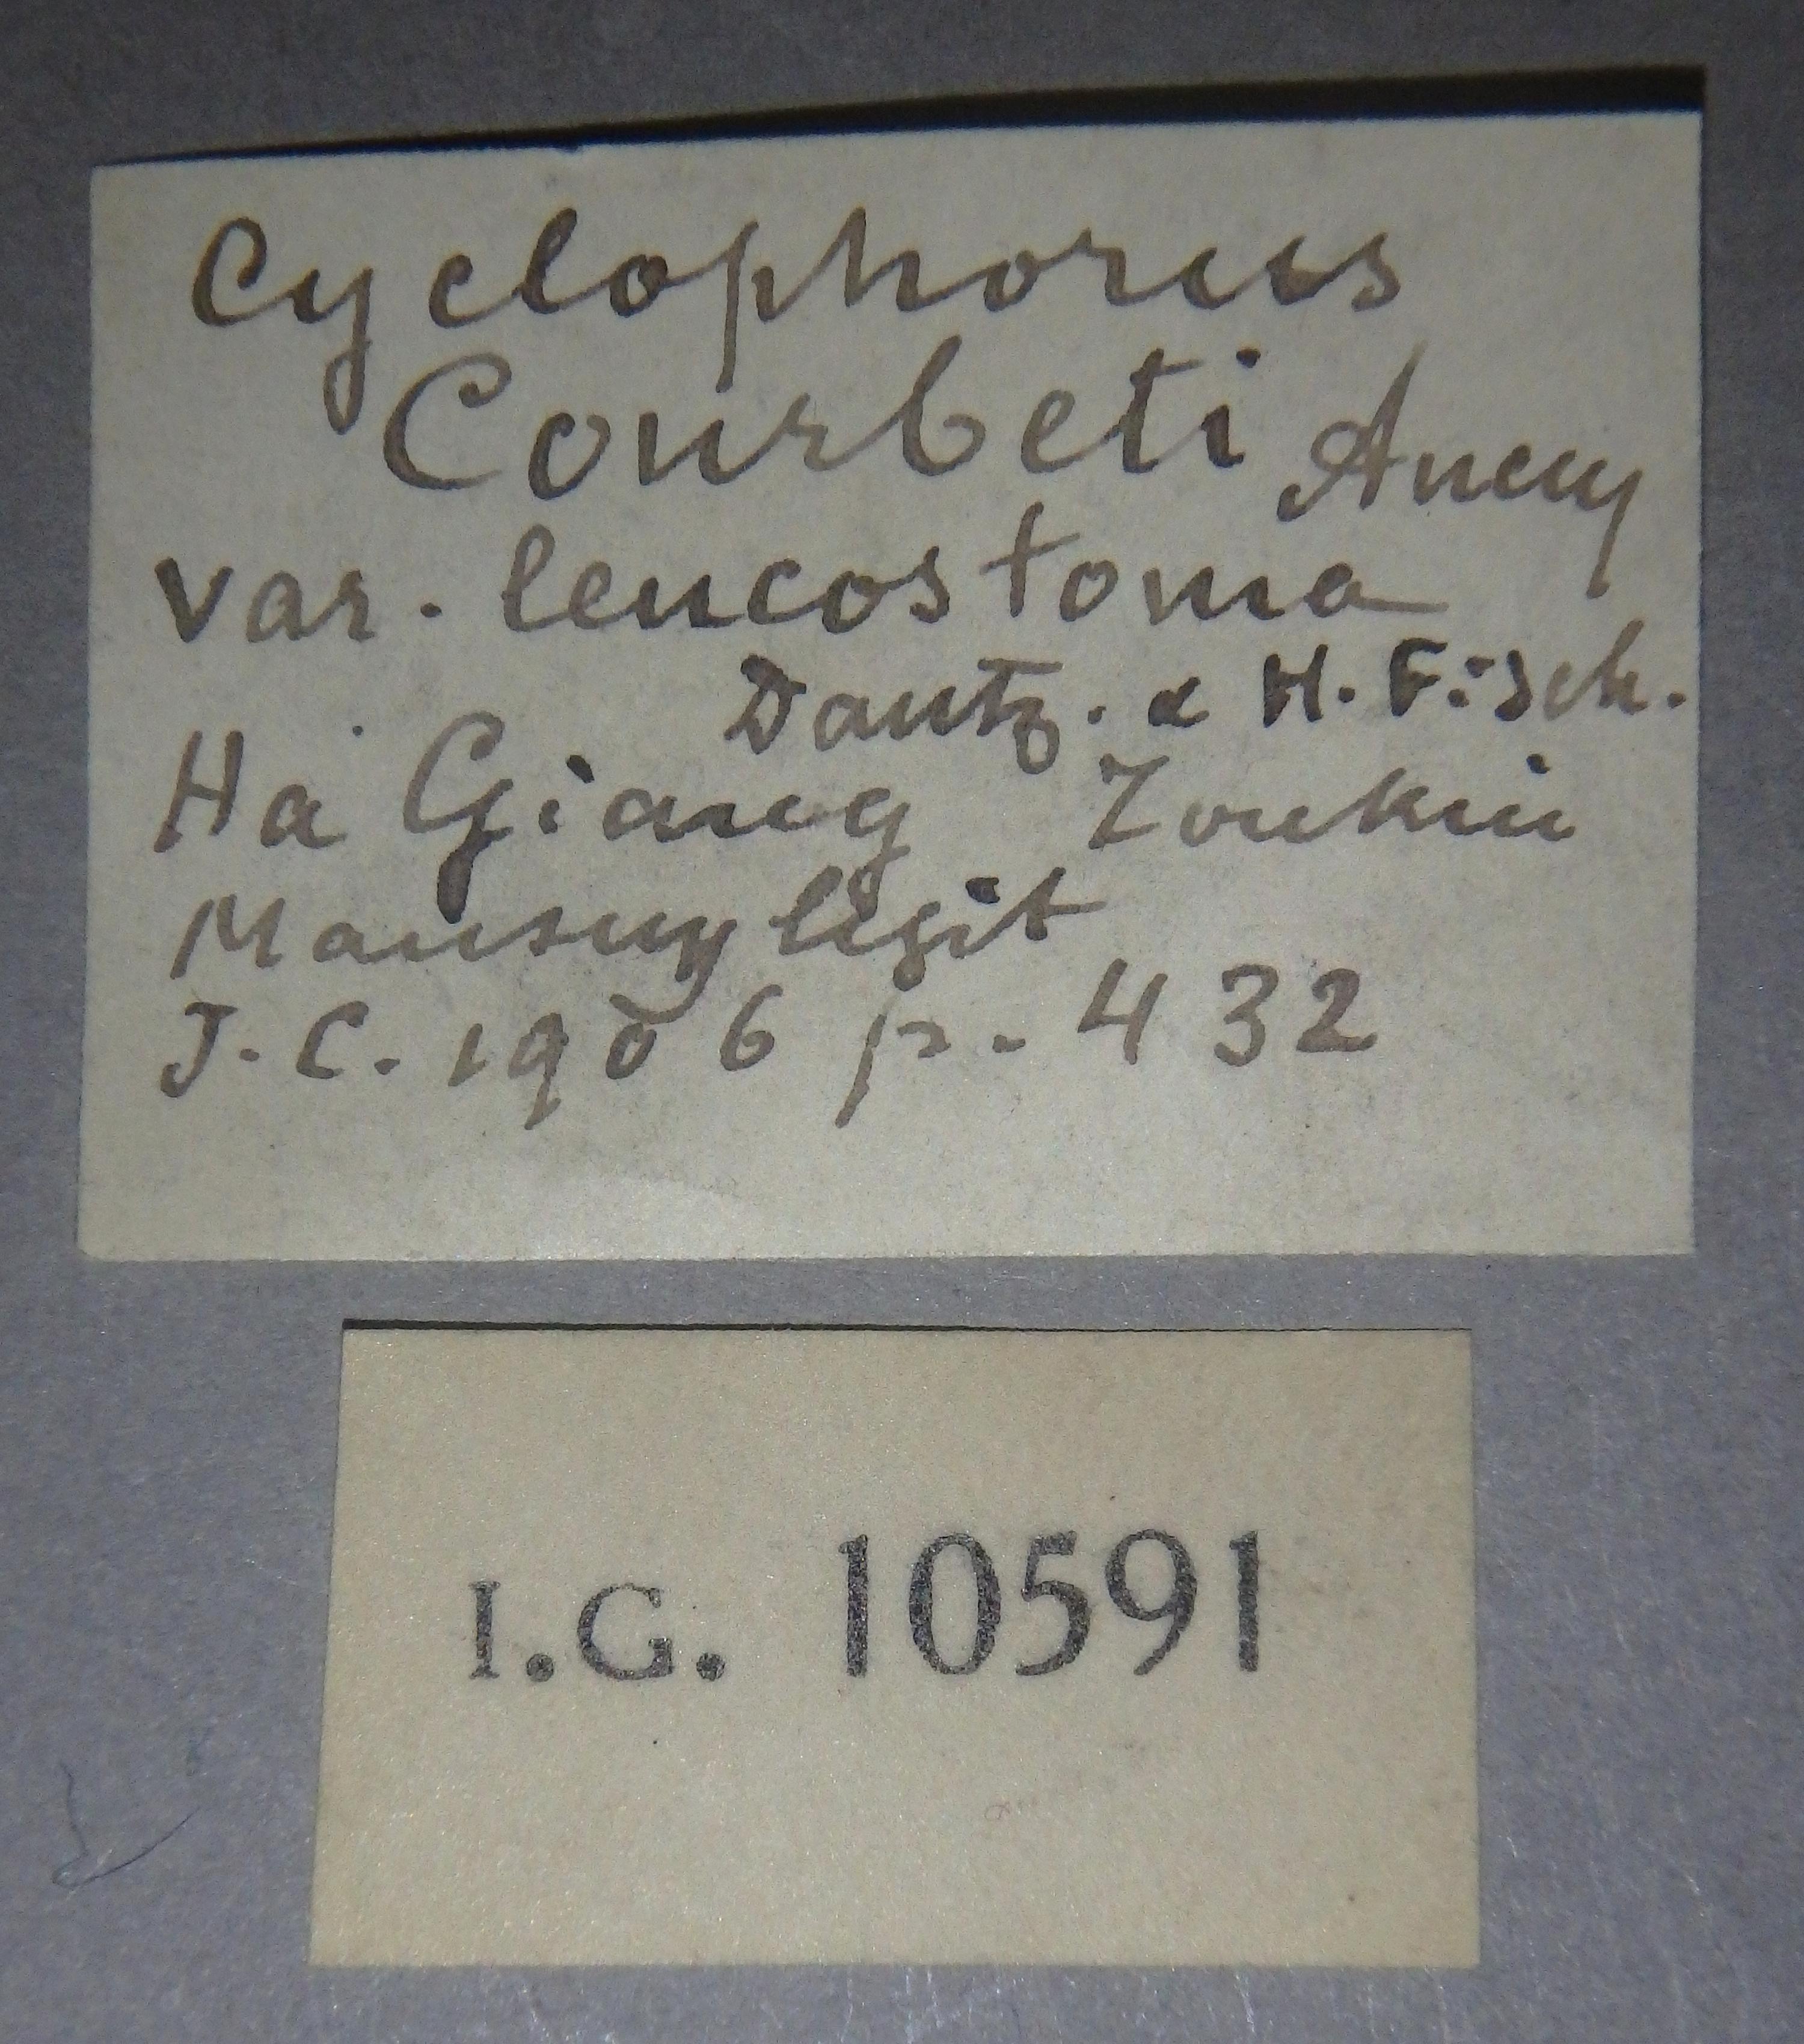 BE-RBINS-INV MT 894/1 Cyclophorus courbeti var. leucostoma pt Lb.jpg